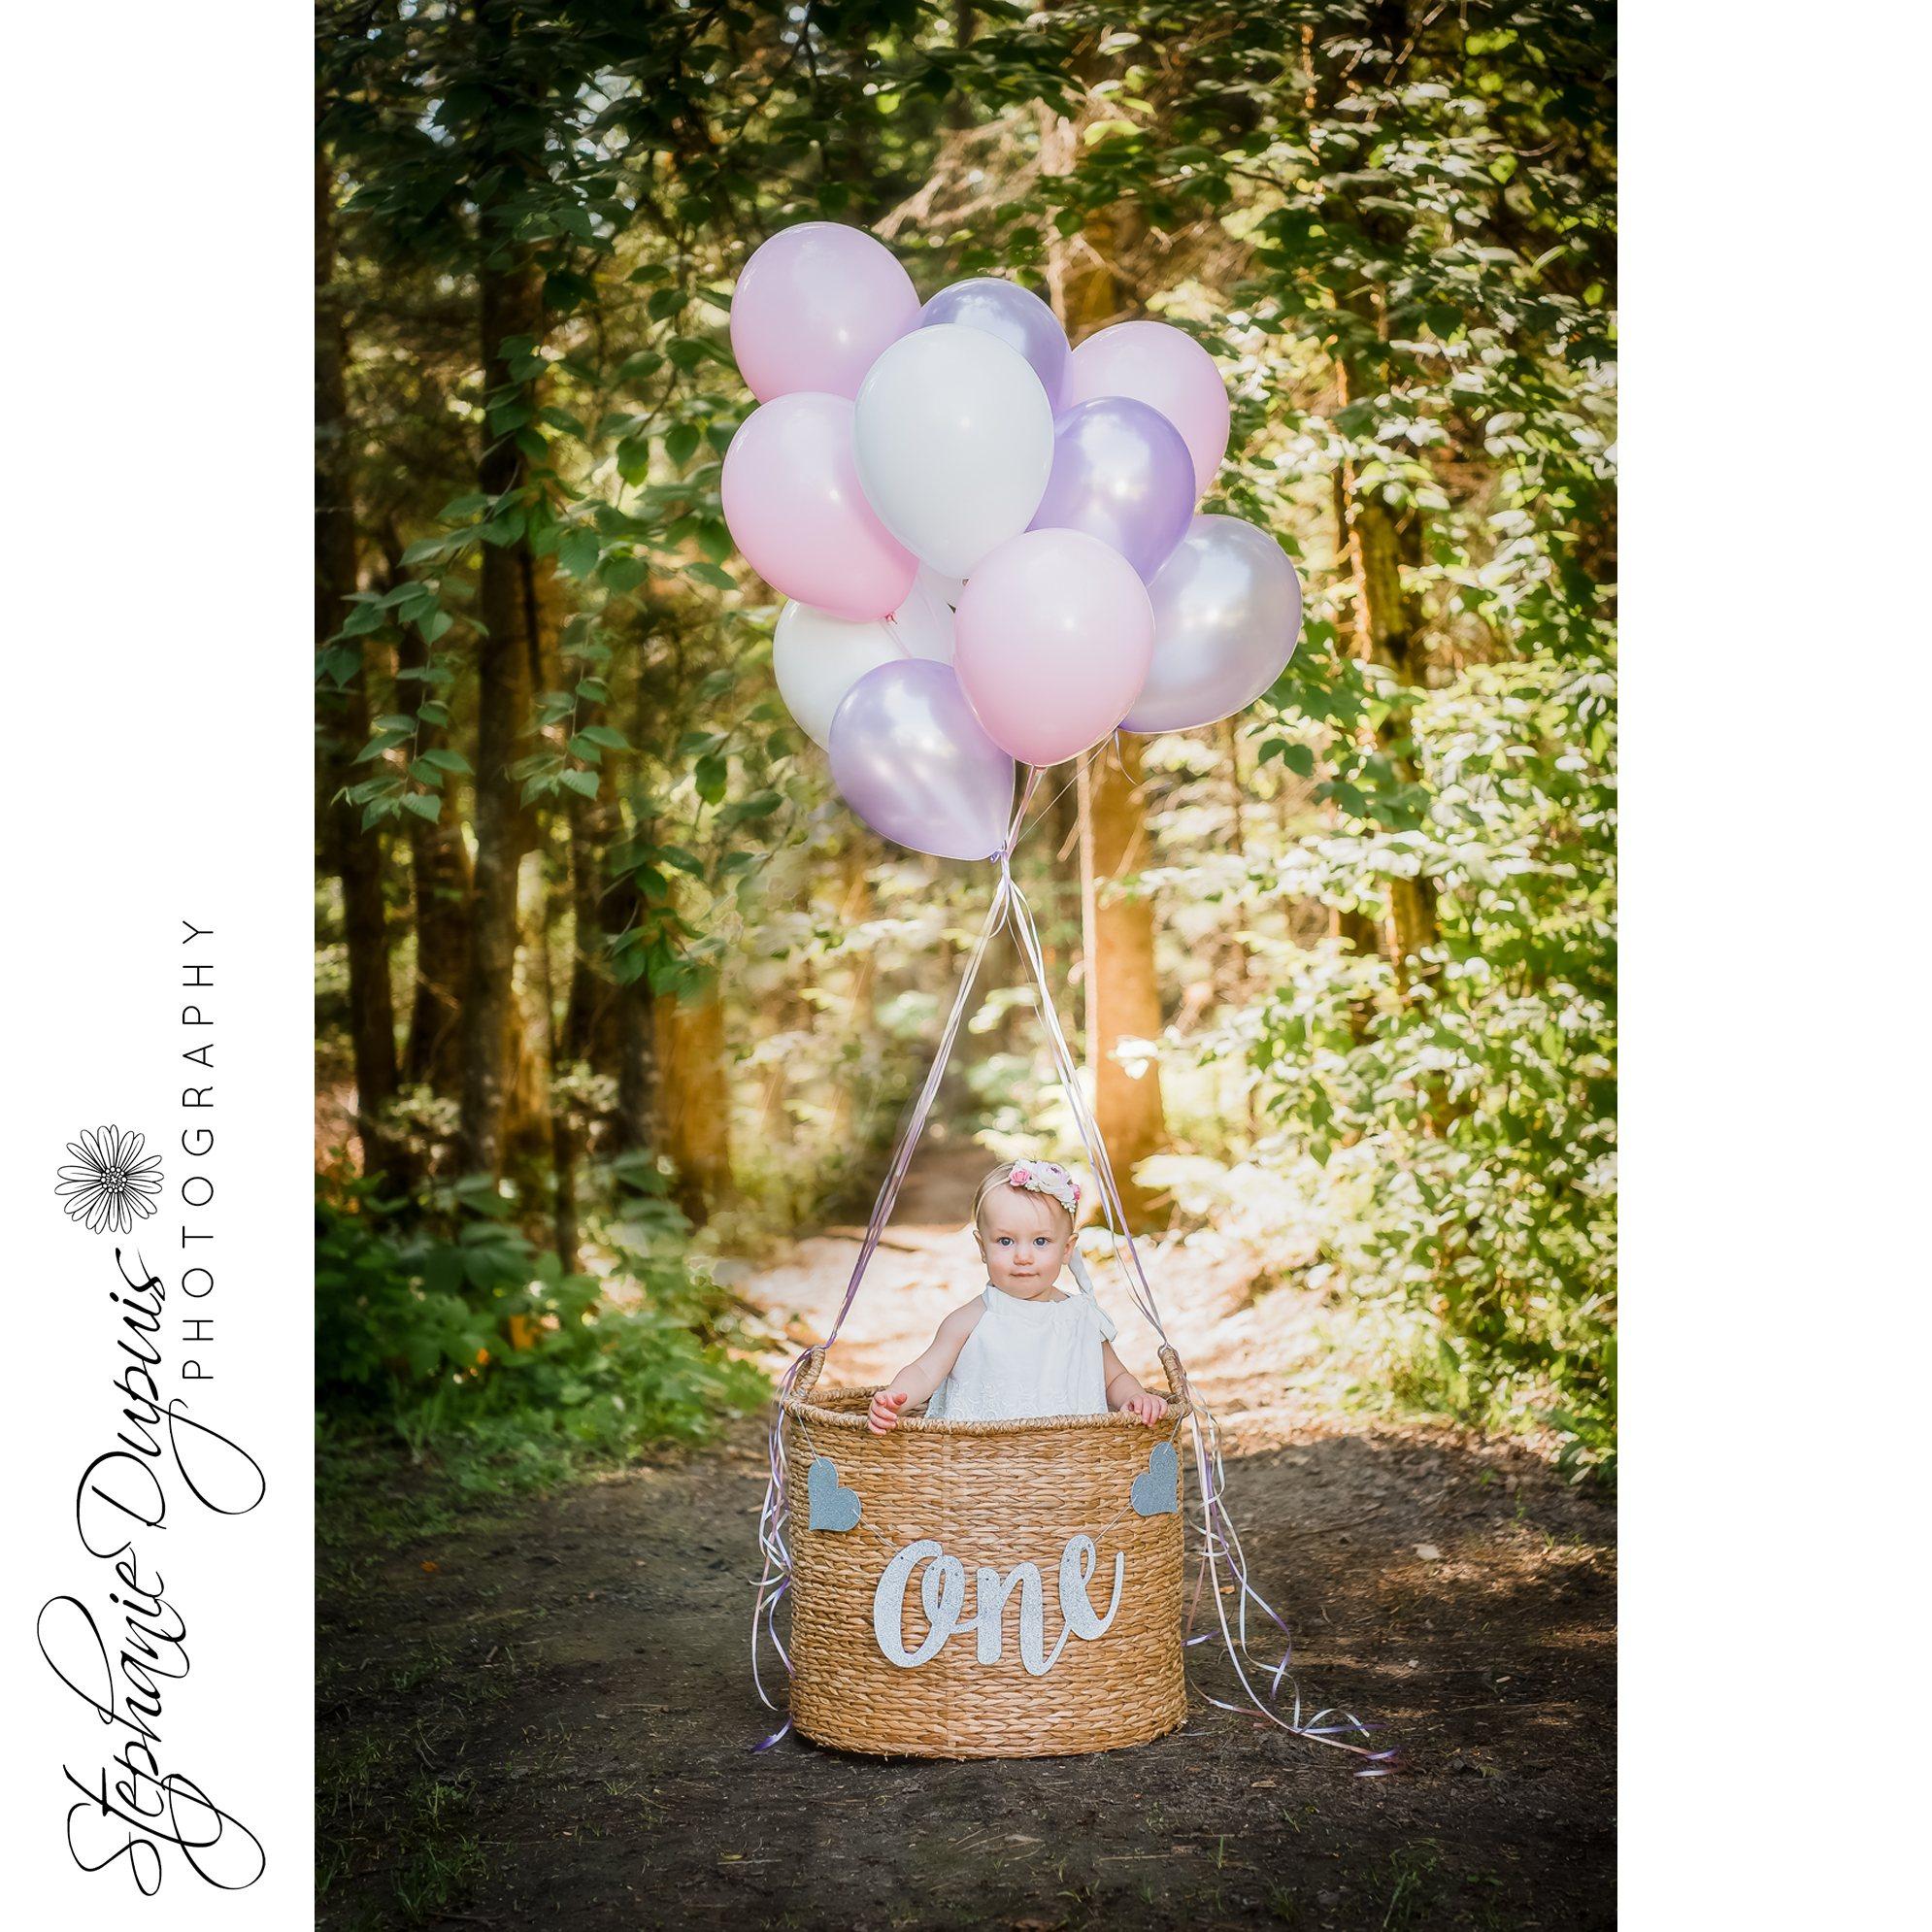 Kelly Jo 1 e - Portfolio: Kelly Jo Infant Session